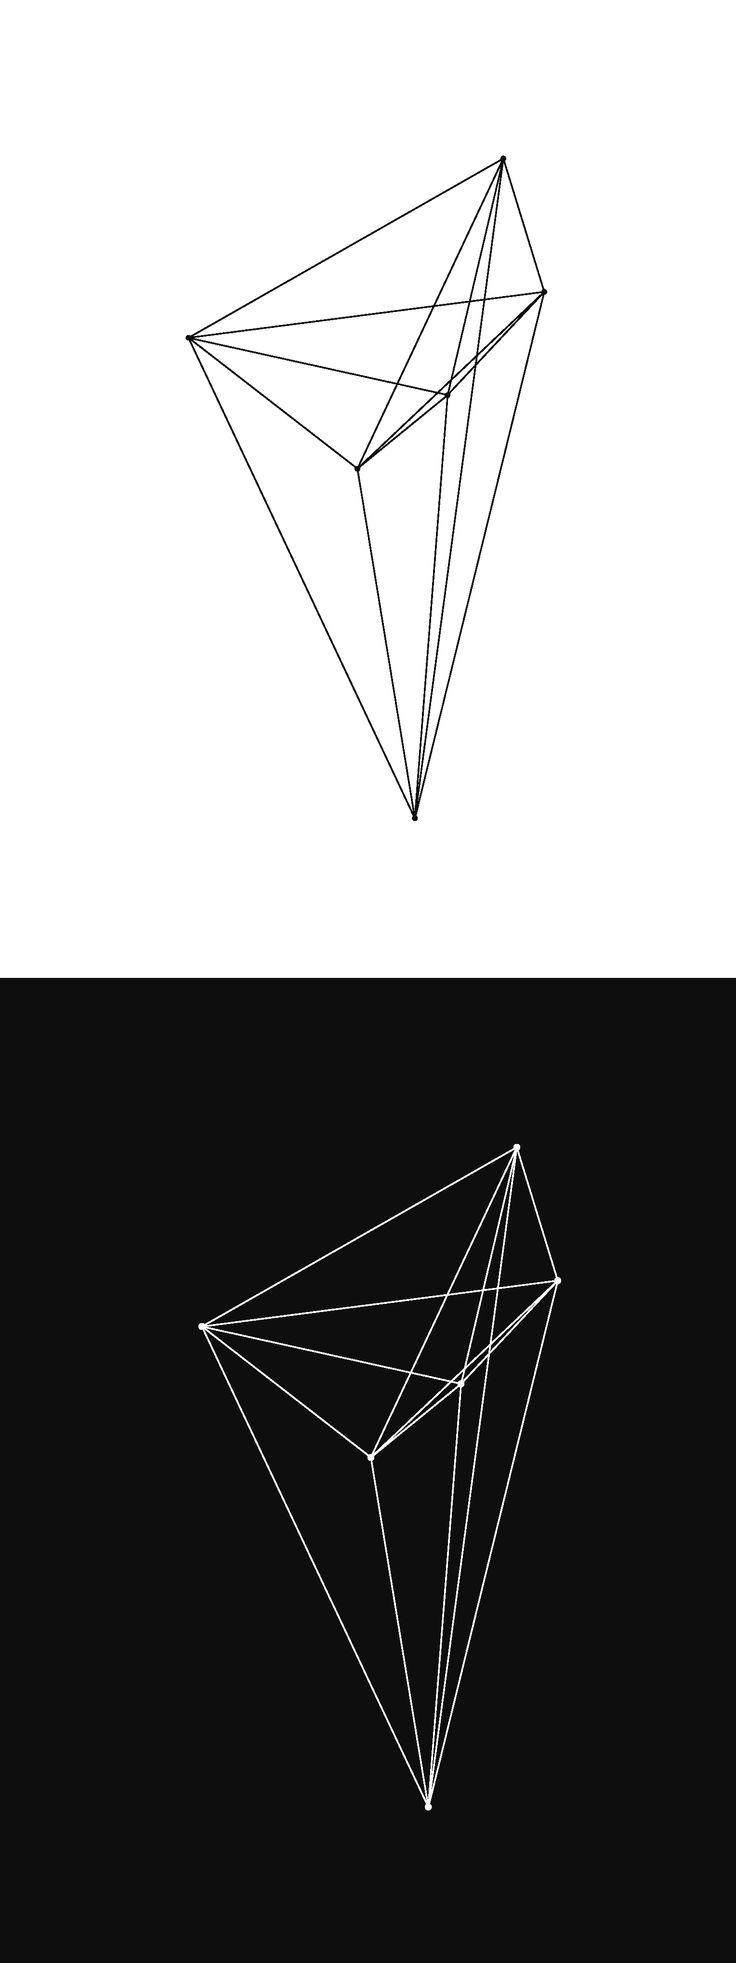 Femte element: Diamanten